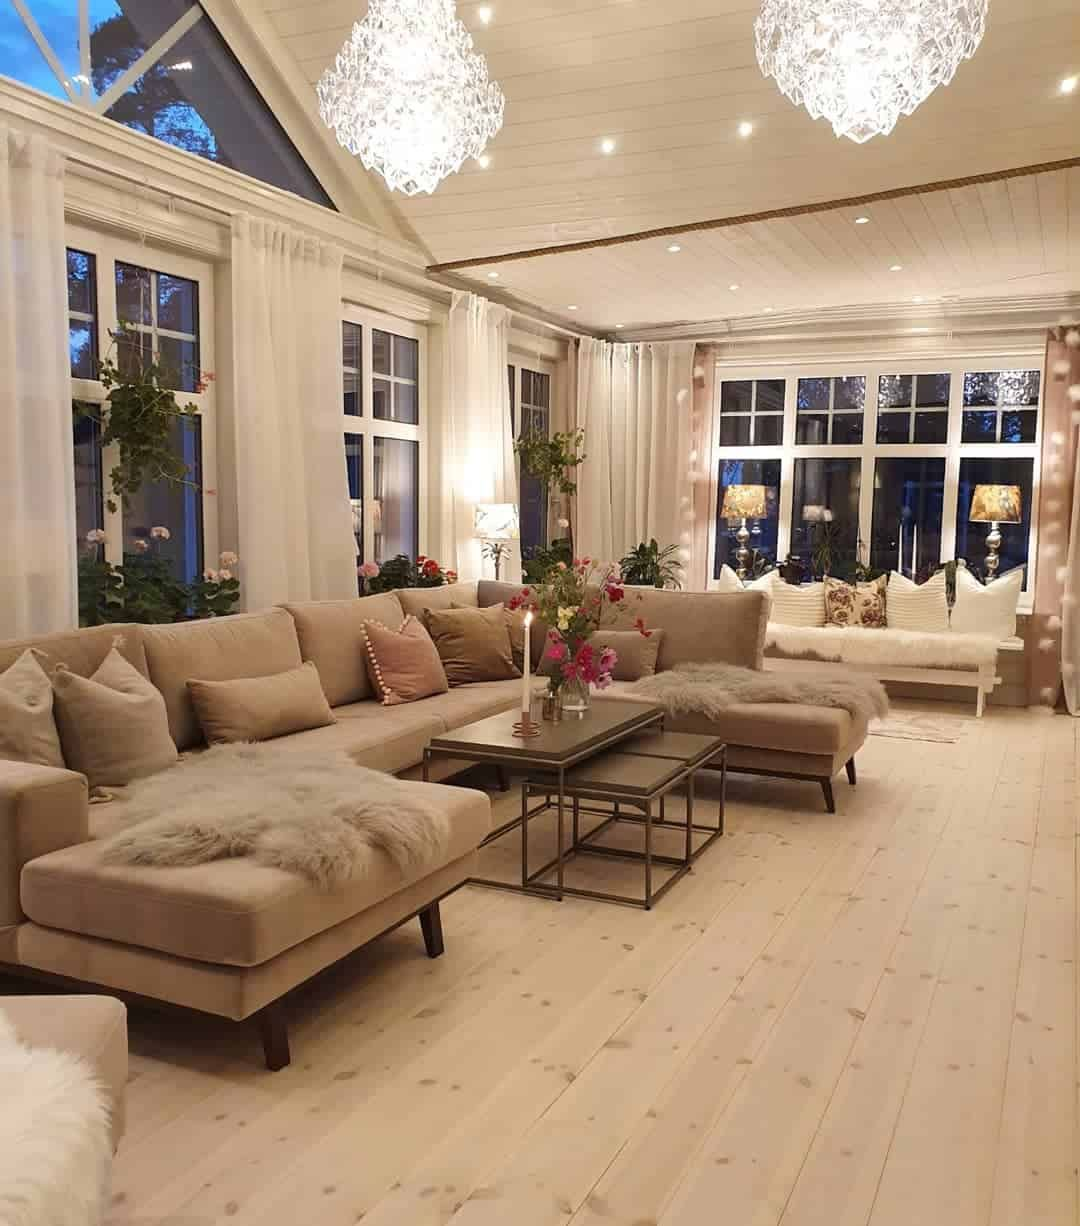 Scandinavian Decor - Home Tour In Sweden | Hygge home ...